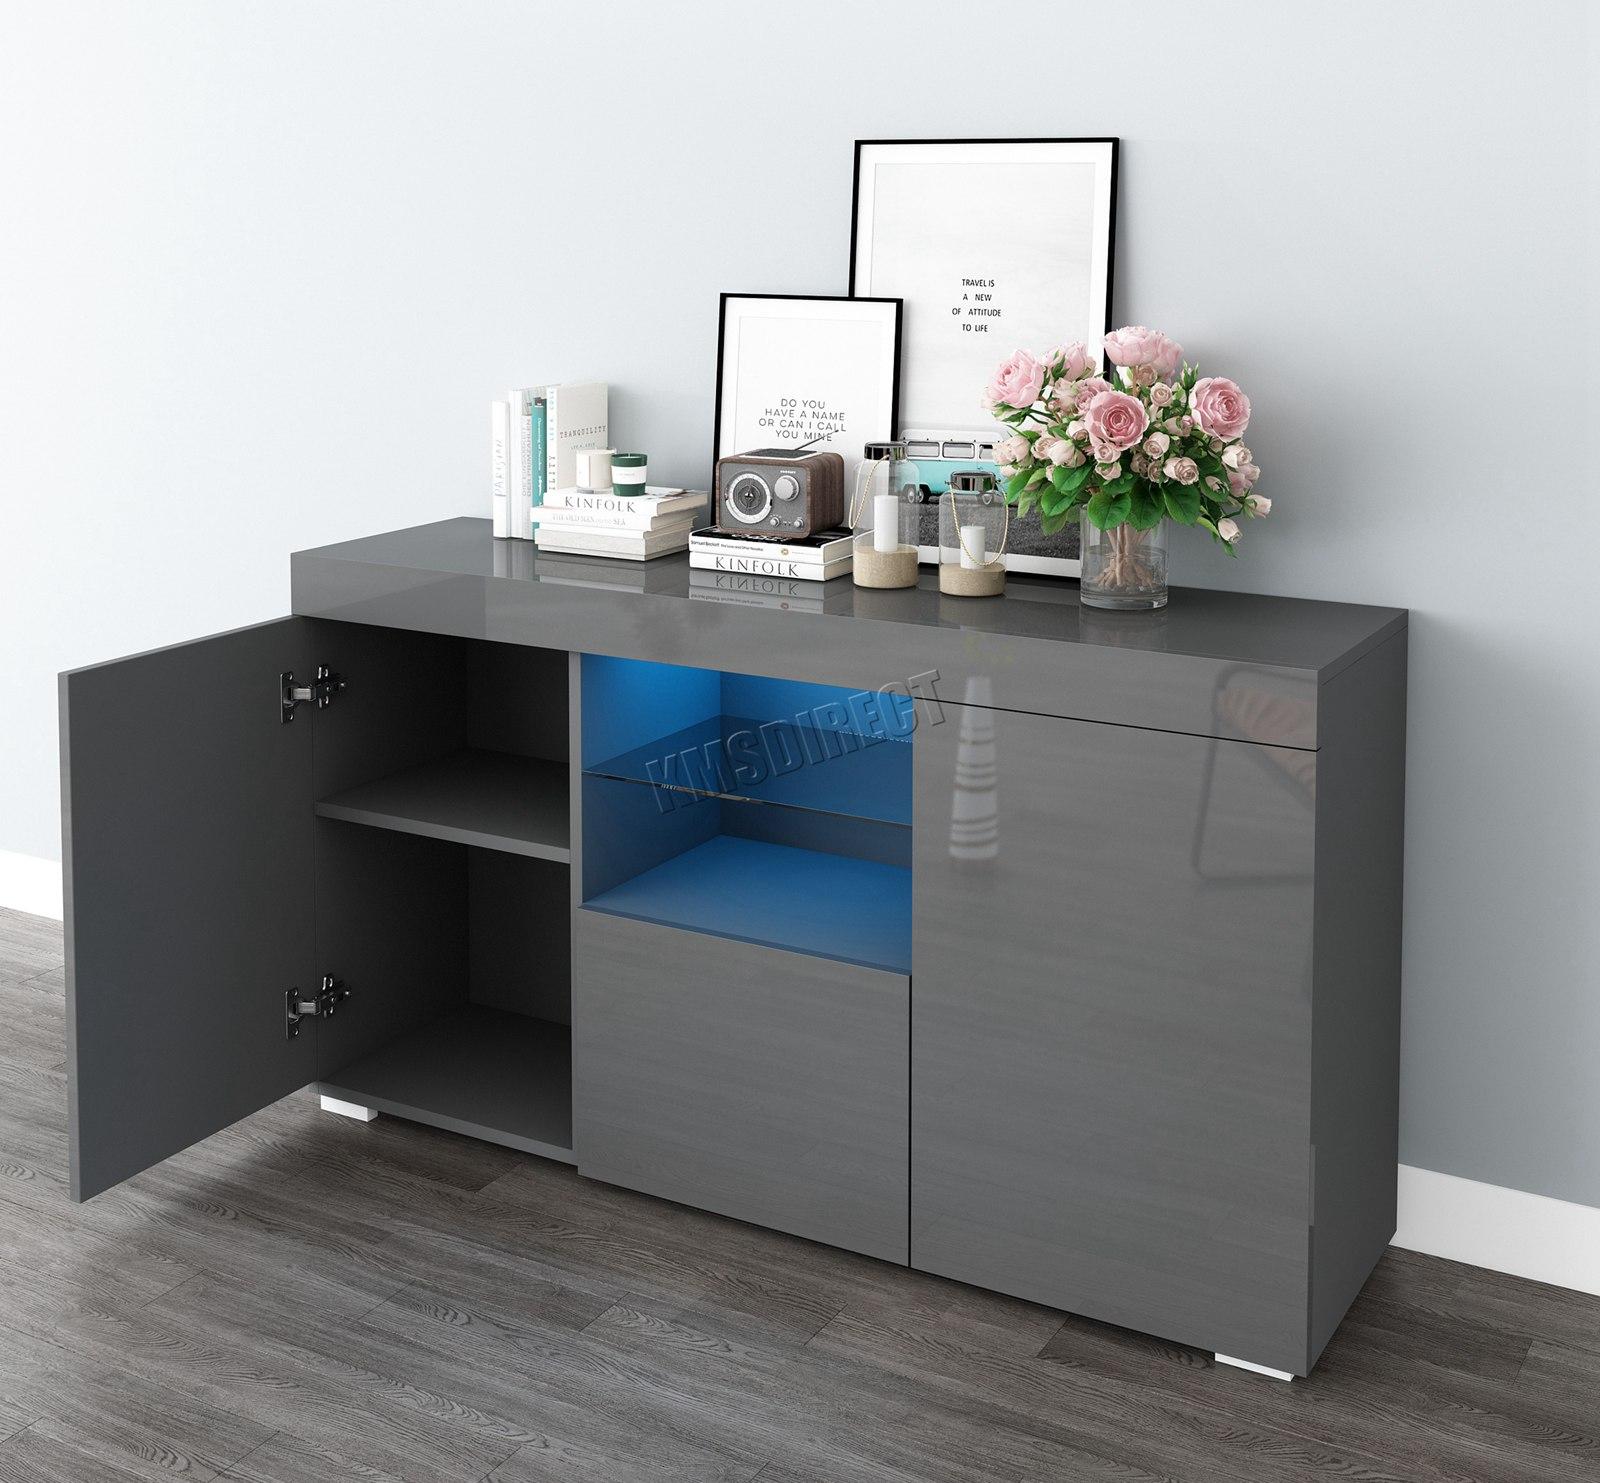 WestWood-PB-High-Gloss-Cabinet-LED-Bookshelf-Sideboard-Cupboard-Home-Unit-PHC03 thumbnail 21